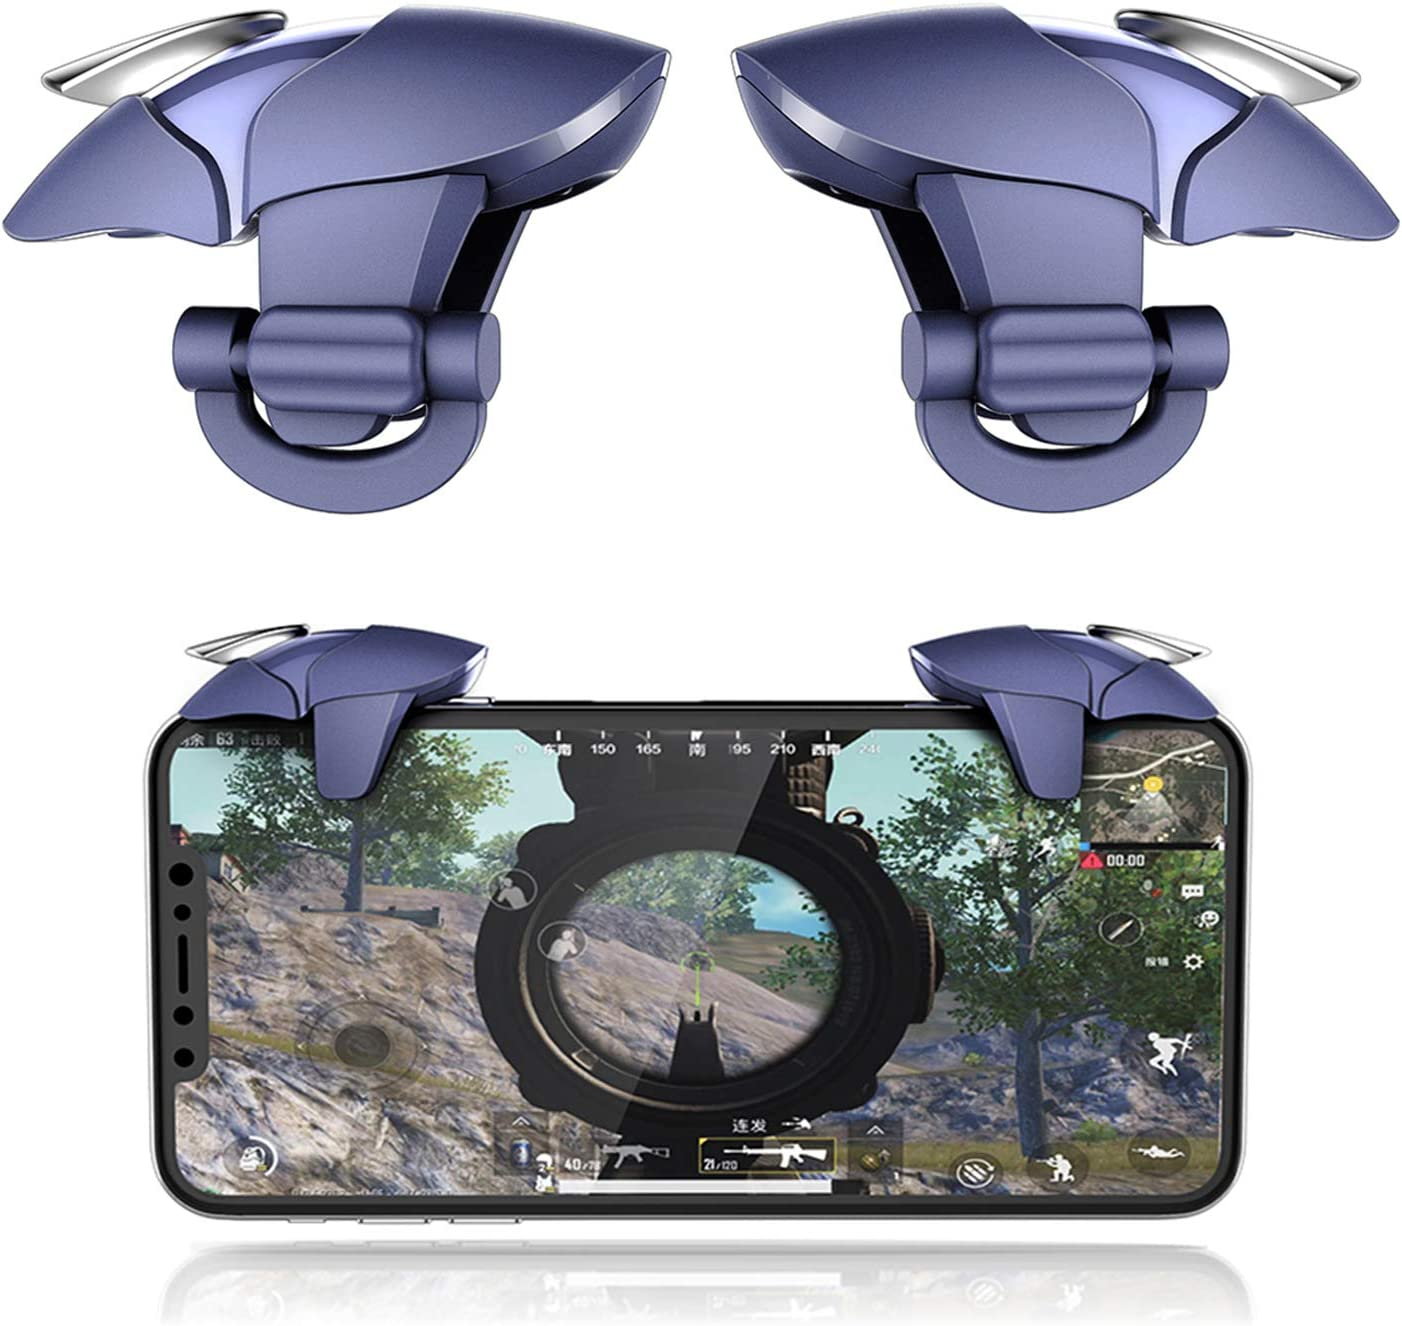 Call of Duty Sensitive Shoot und Ziel L1R1 Joystick kompatibel mit Android iPhone /& iPad Handy Gamepad Accesorios Mobile Trigger Delam PUBG Mobile Controller